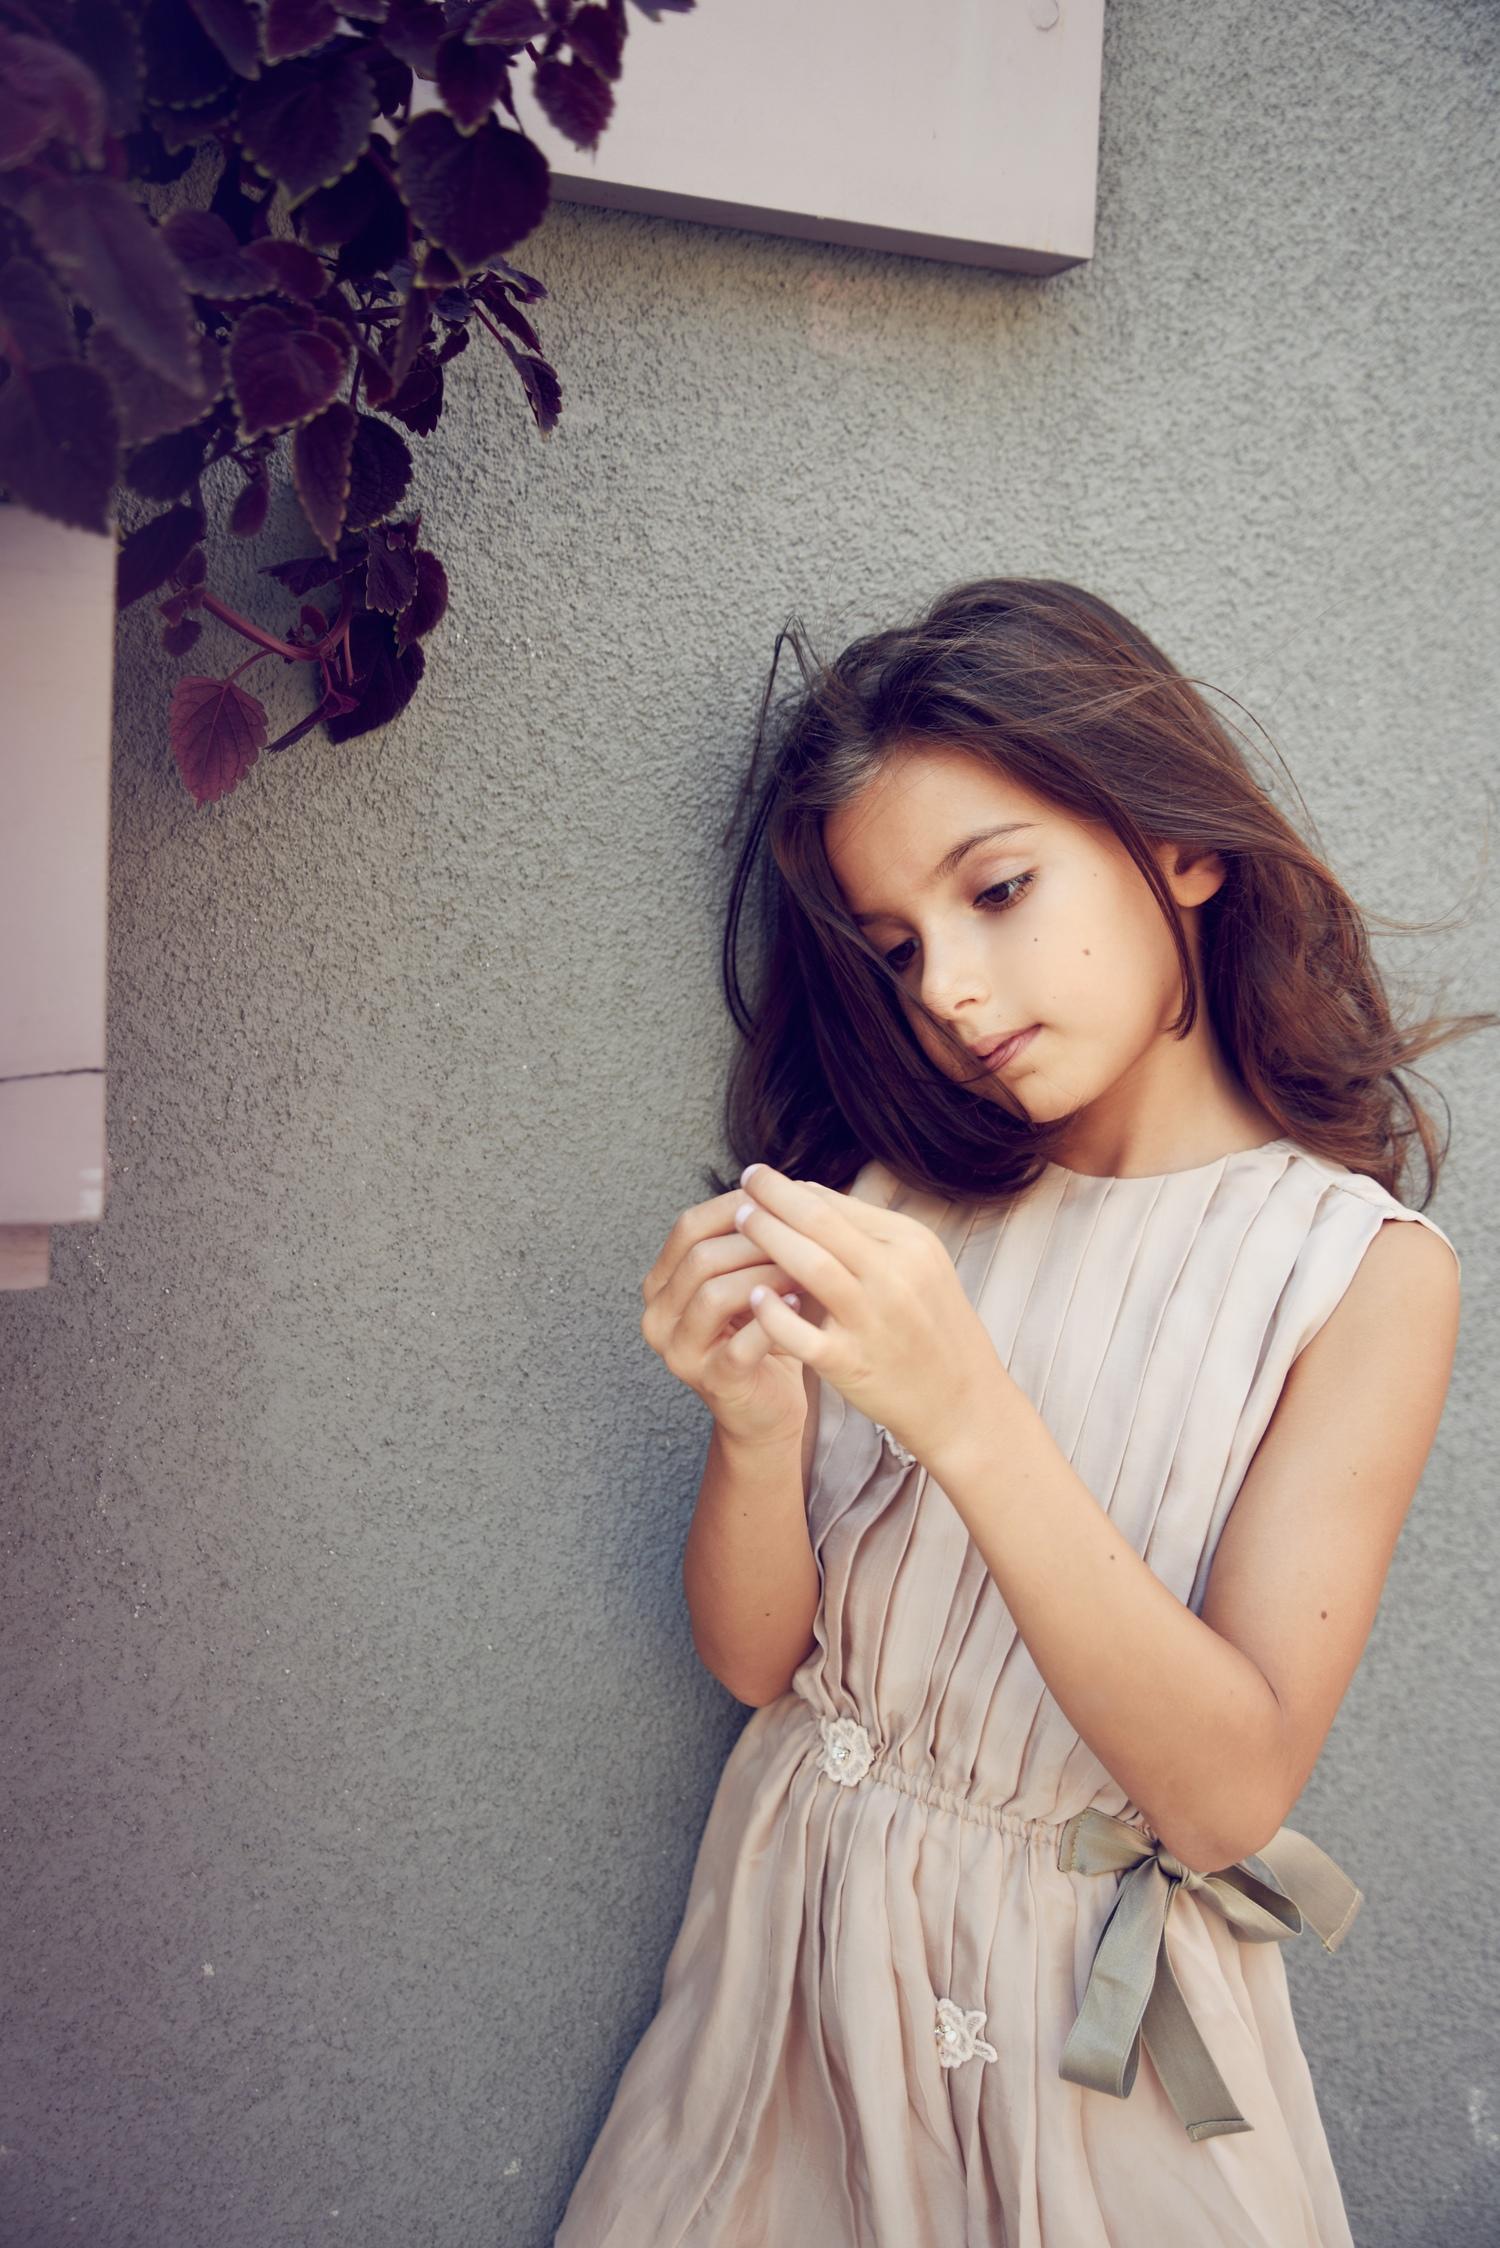 Enfant+Street+Style+by+Gina+Kim+Photography+lamantine+paris.jpeg